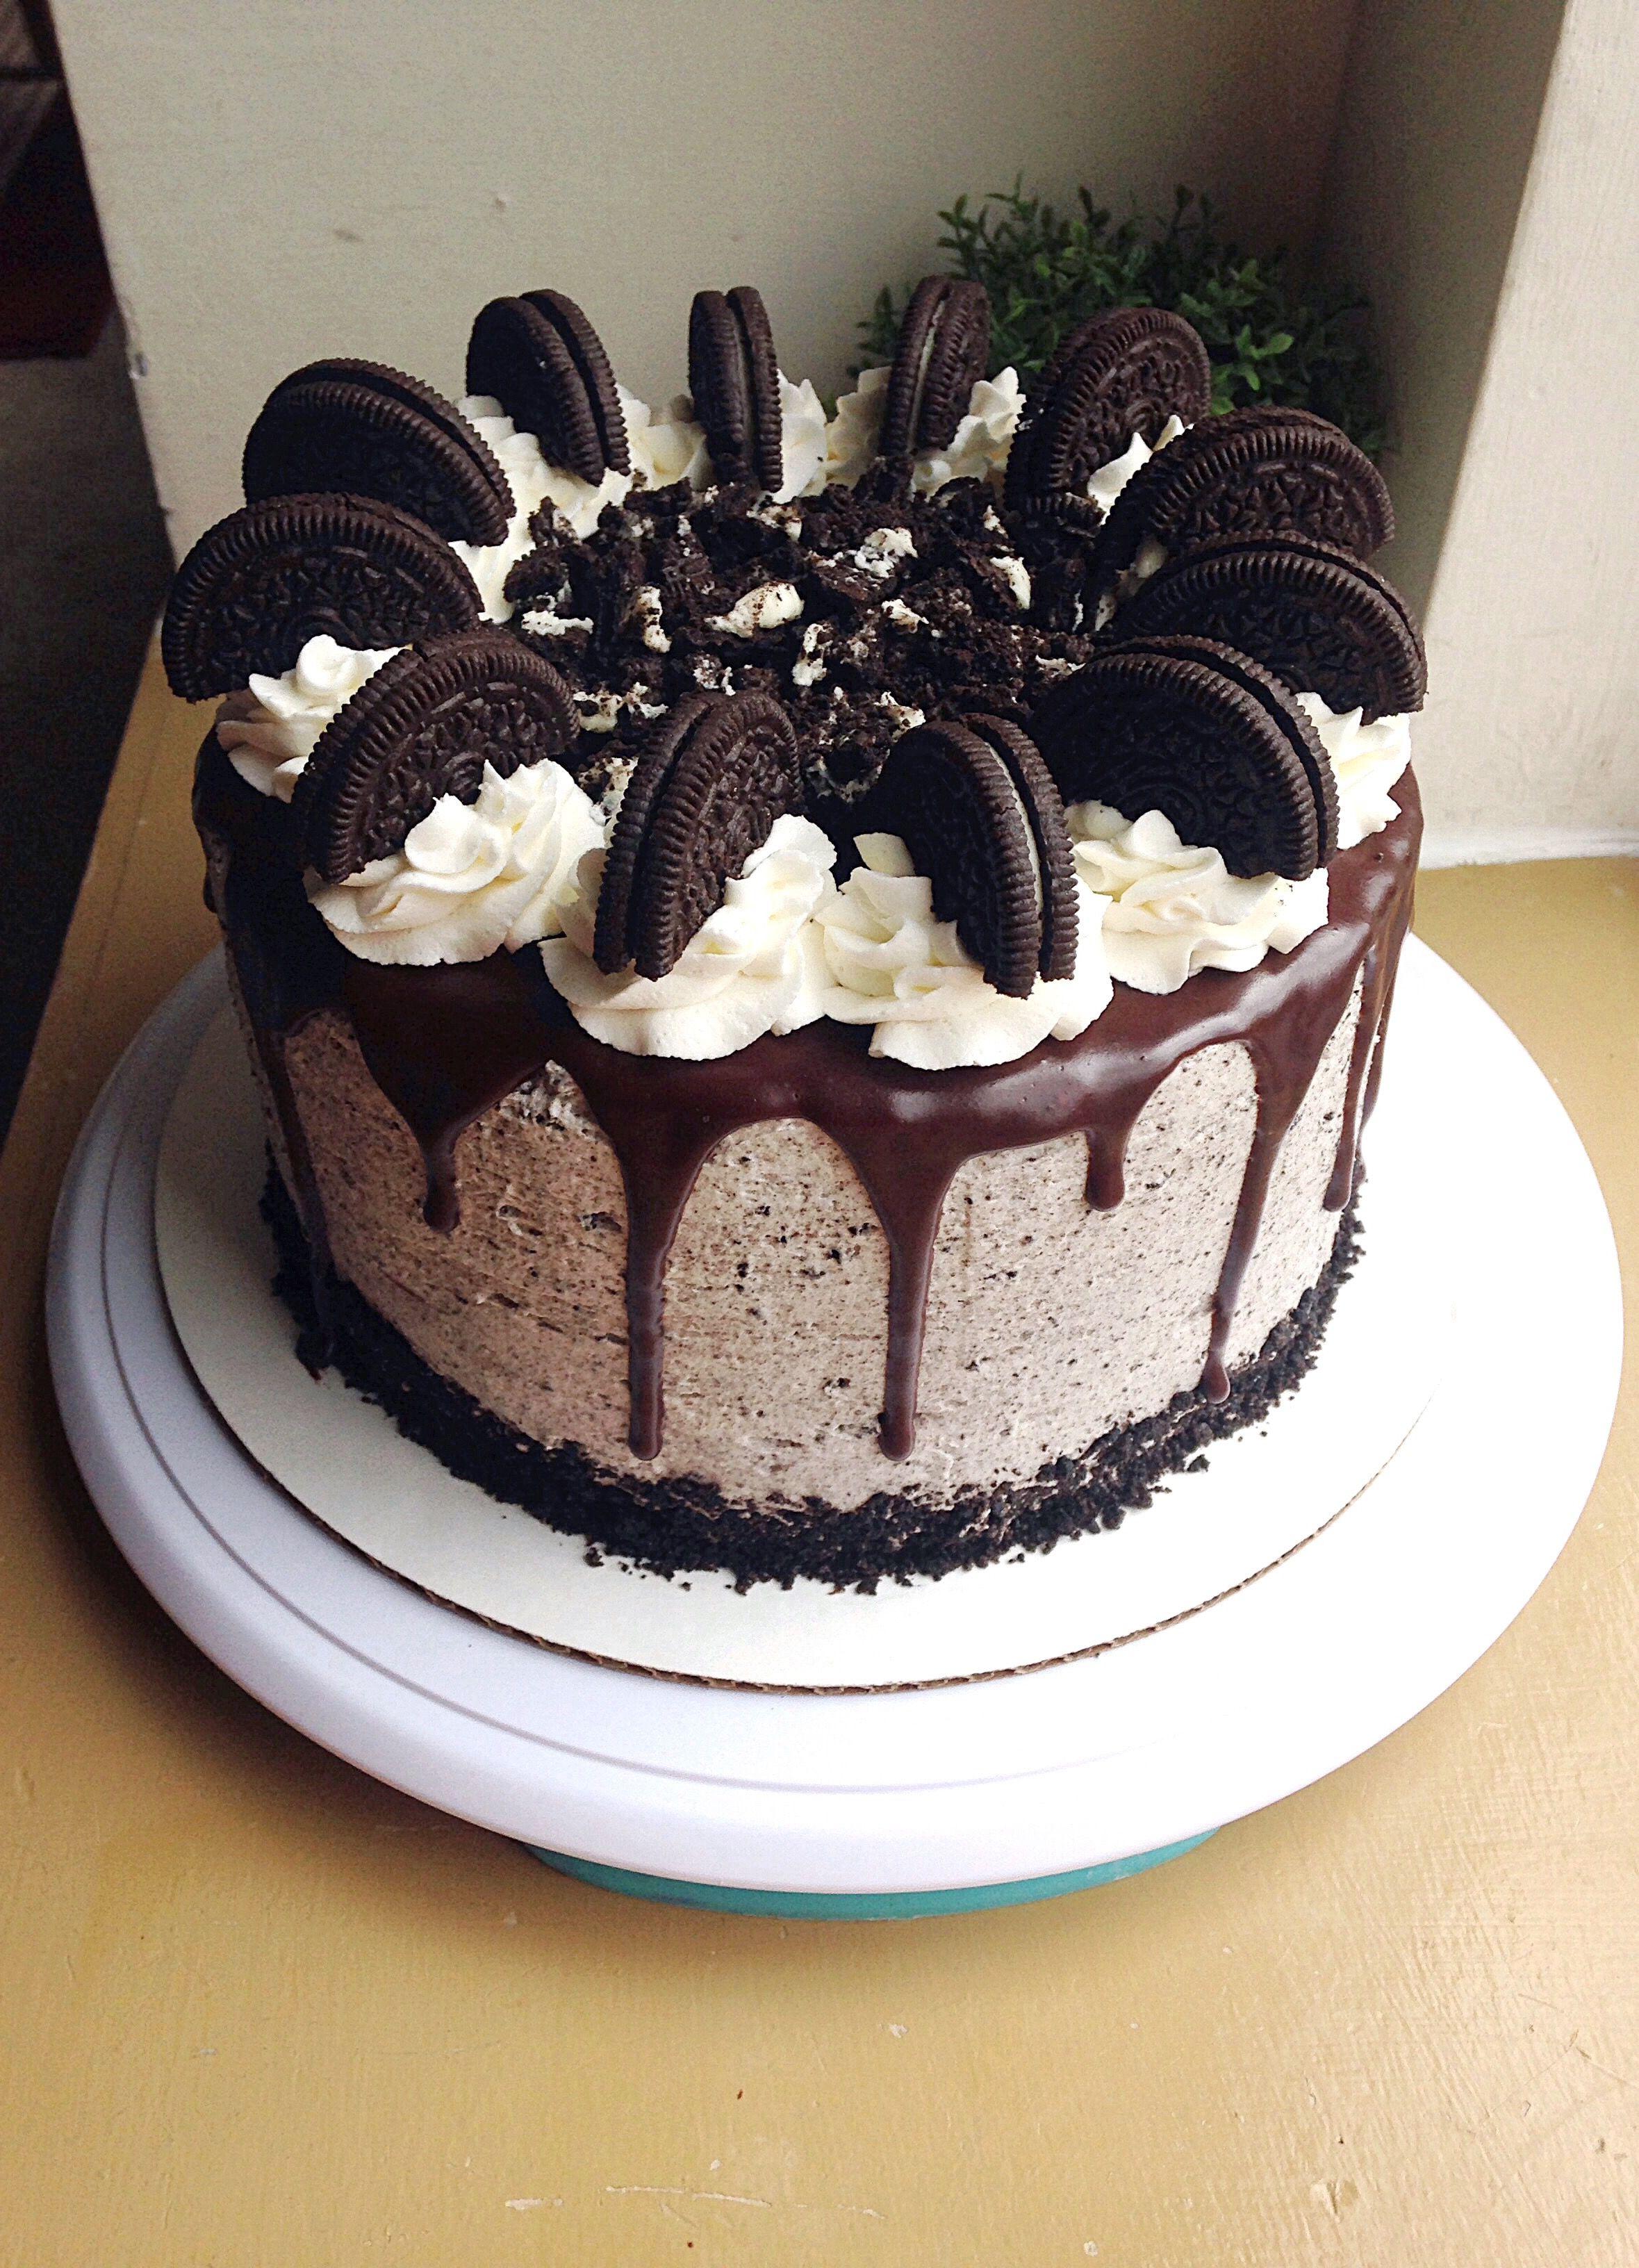 Enjoyable I Made An Oreo Drip Cake For My Cousins Birthday Oreo Cake Funny Birthday Cards Online Kookostrdamsfinfo